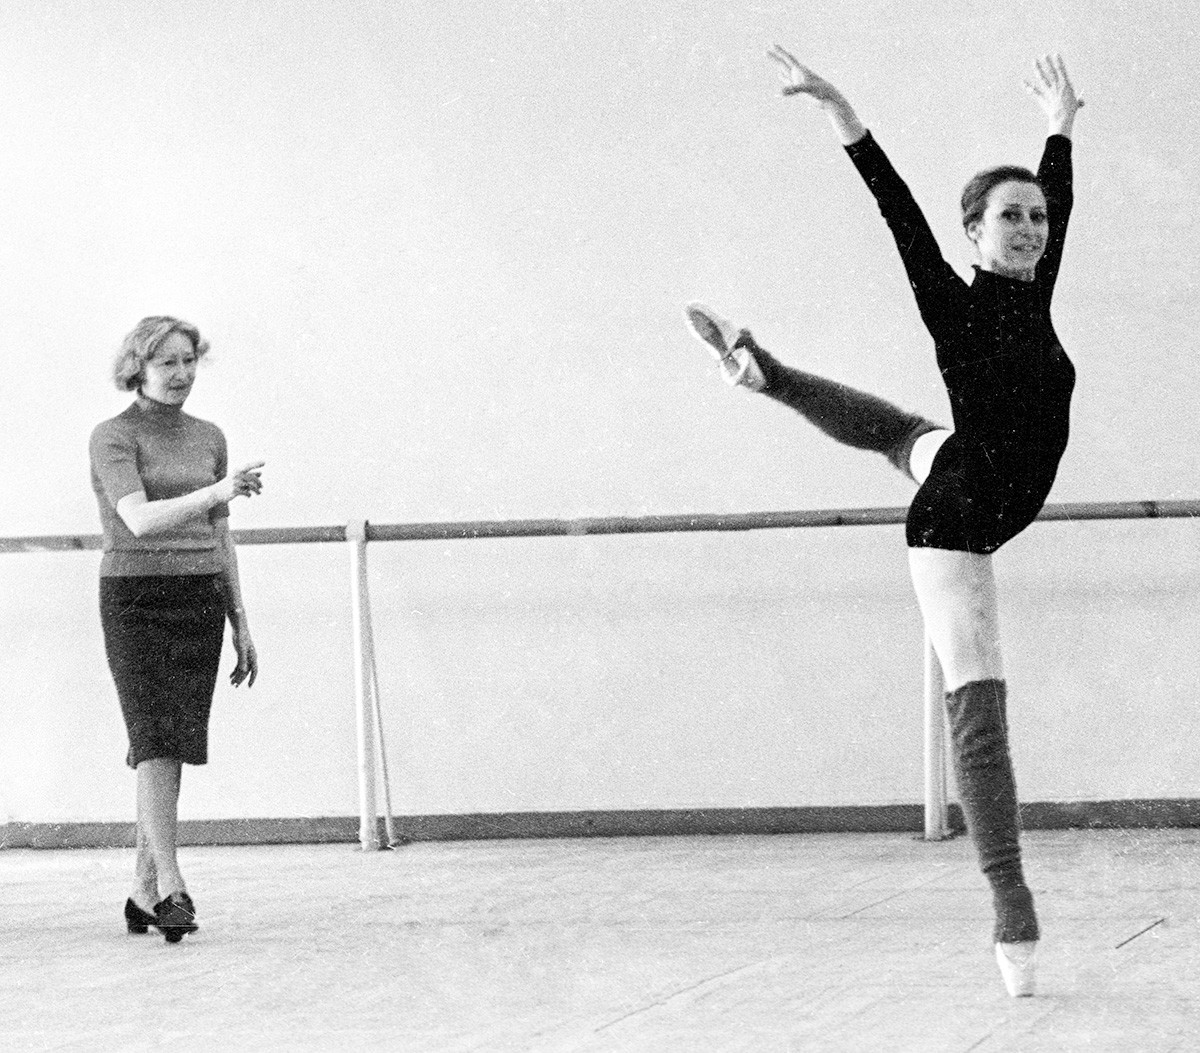 Choreografielehrerin Galina Ulanowa (v.l) und Tänzerin Maja Plissezkaja (v.r) bei Proben, 1969.